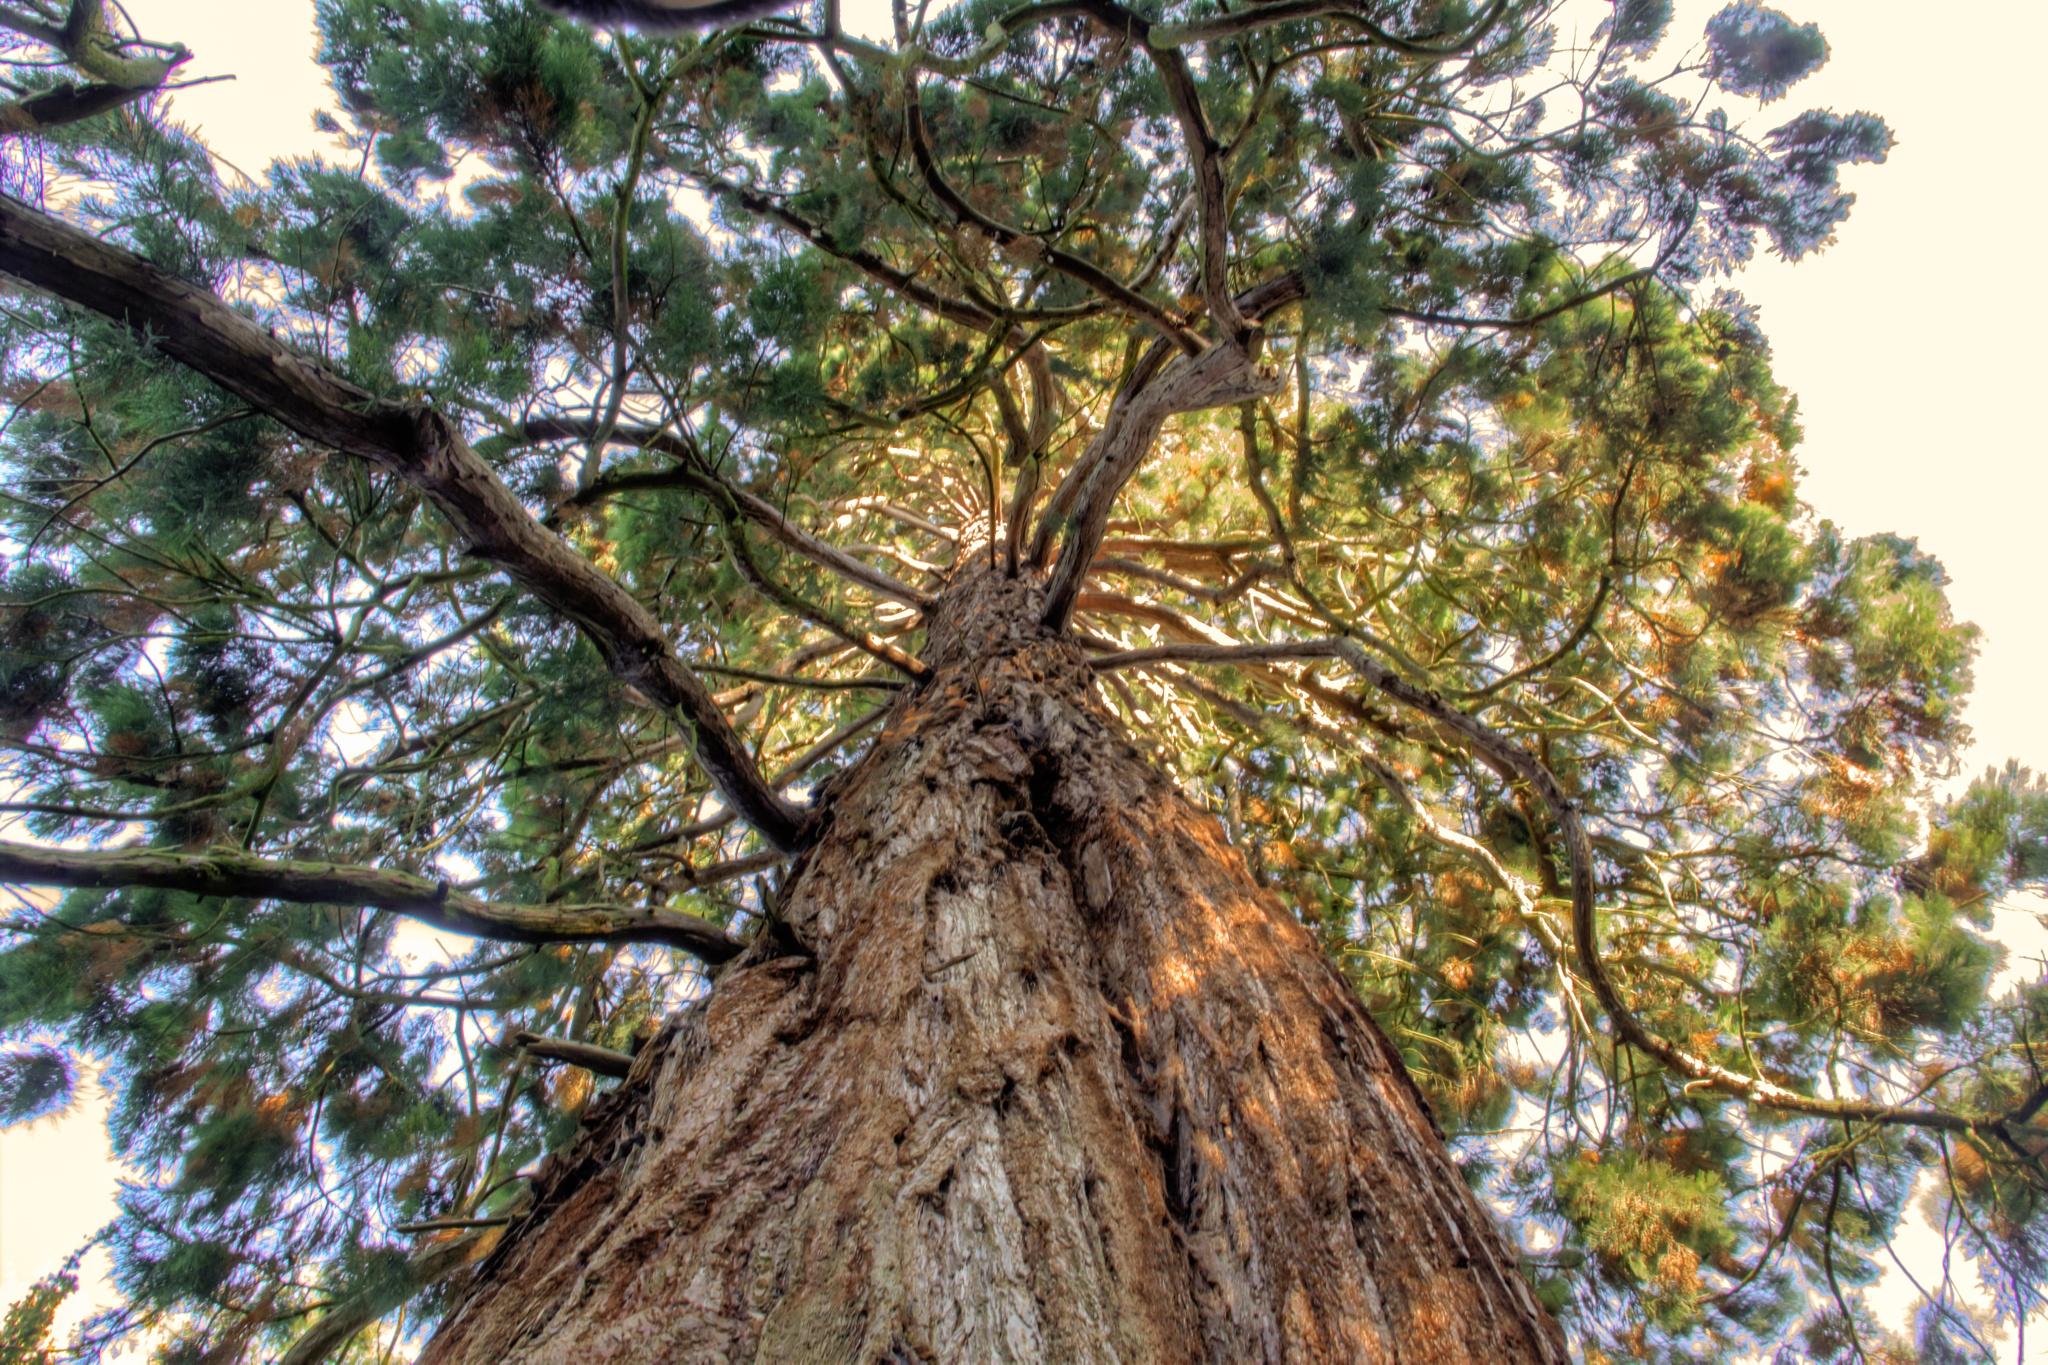 Amazing tree by Stephen Warner